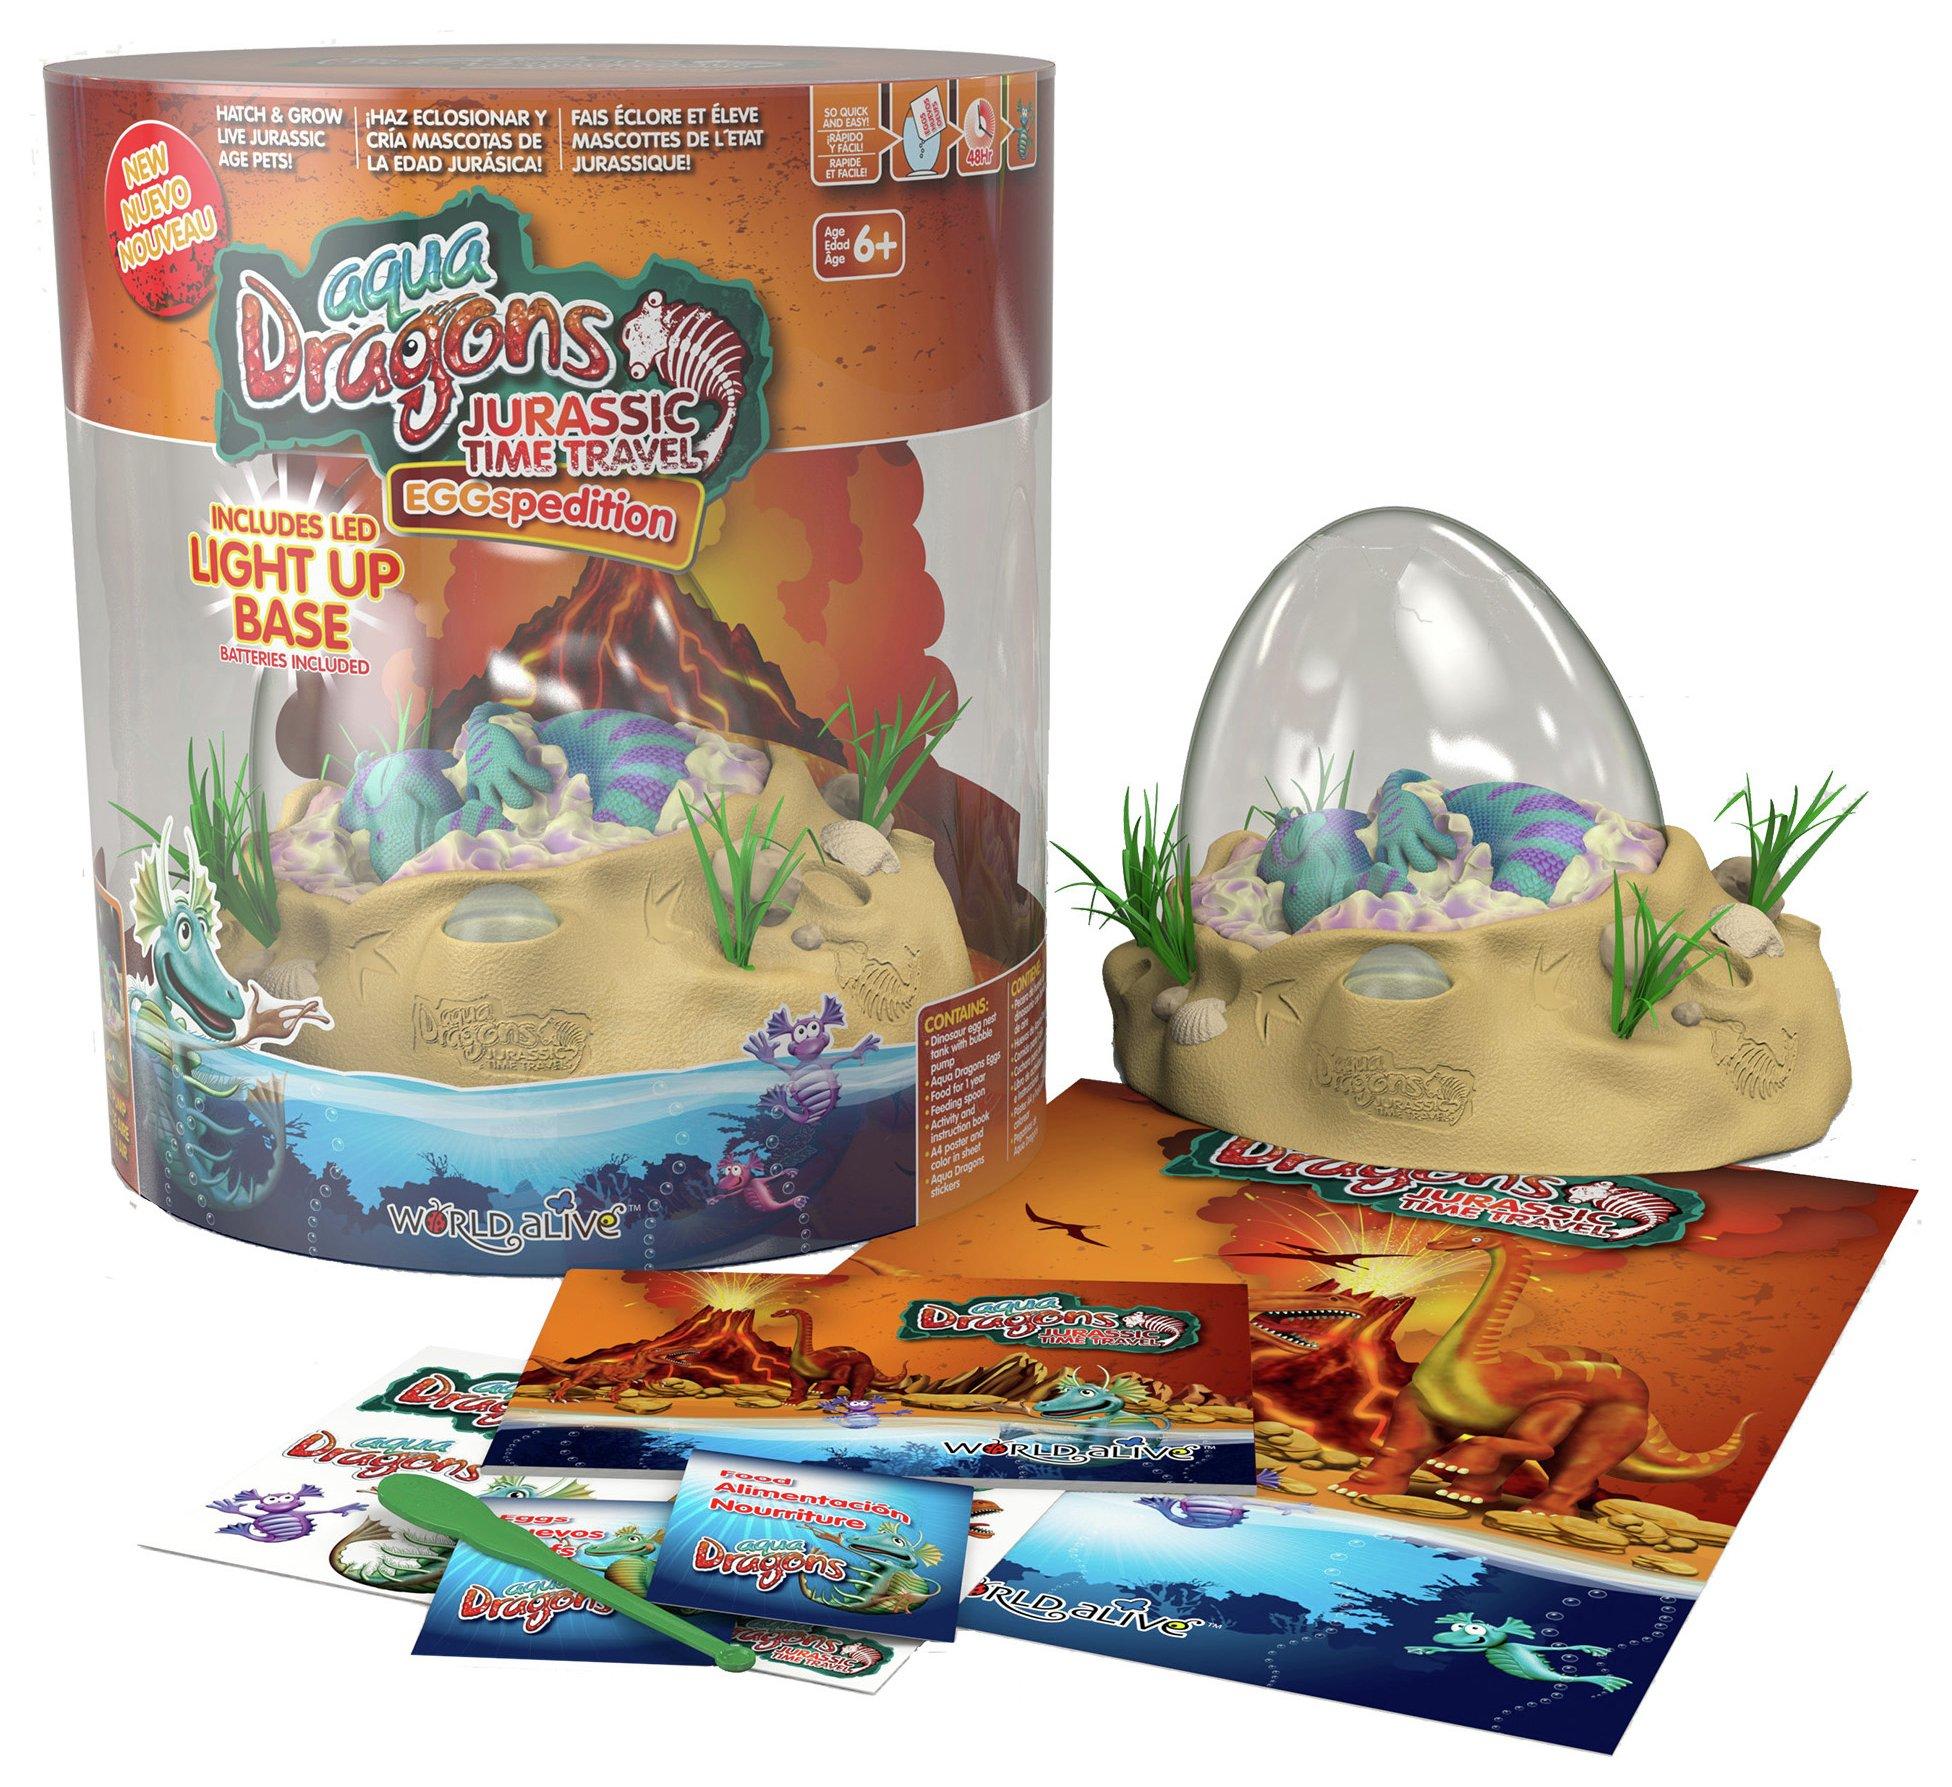 Image of Aqua Dragons Jurassic eGGspedition.